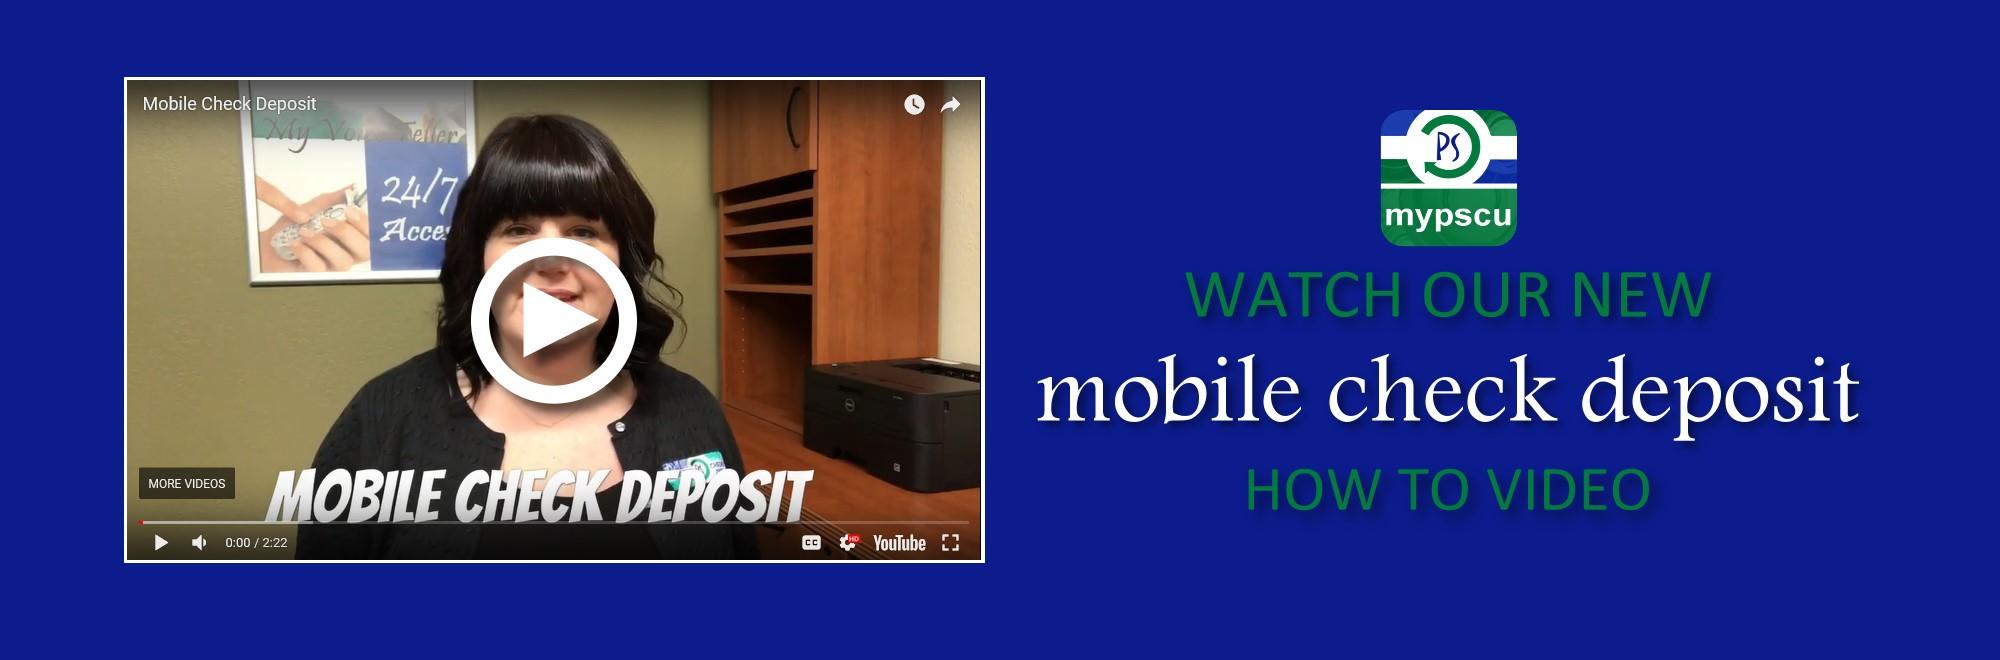 Mobile Check Deposit Video Image